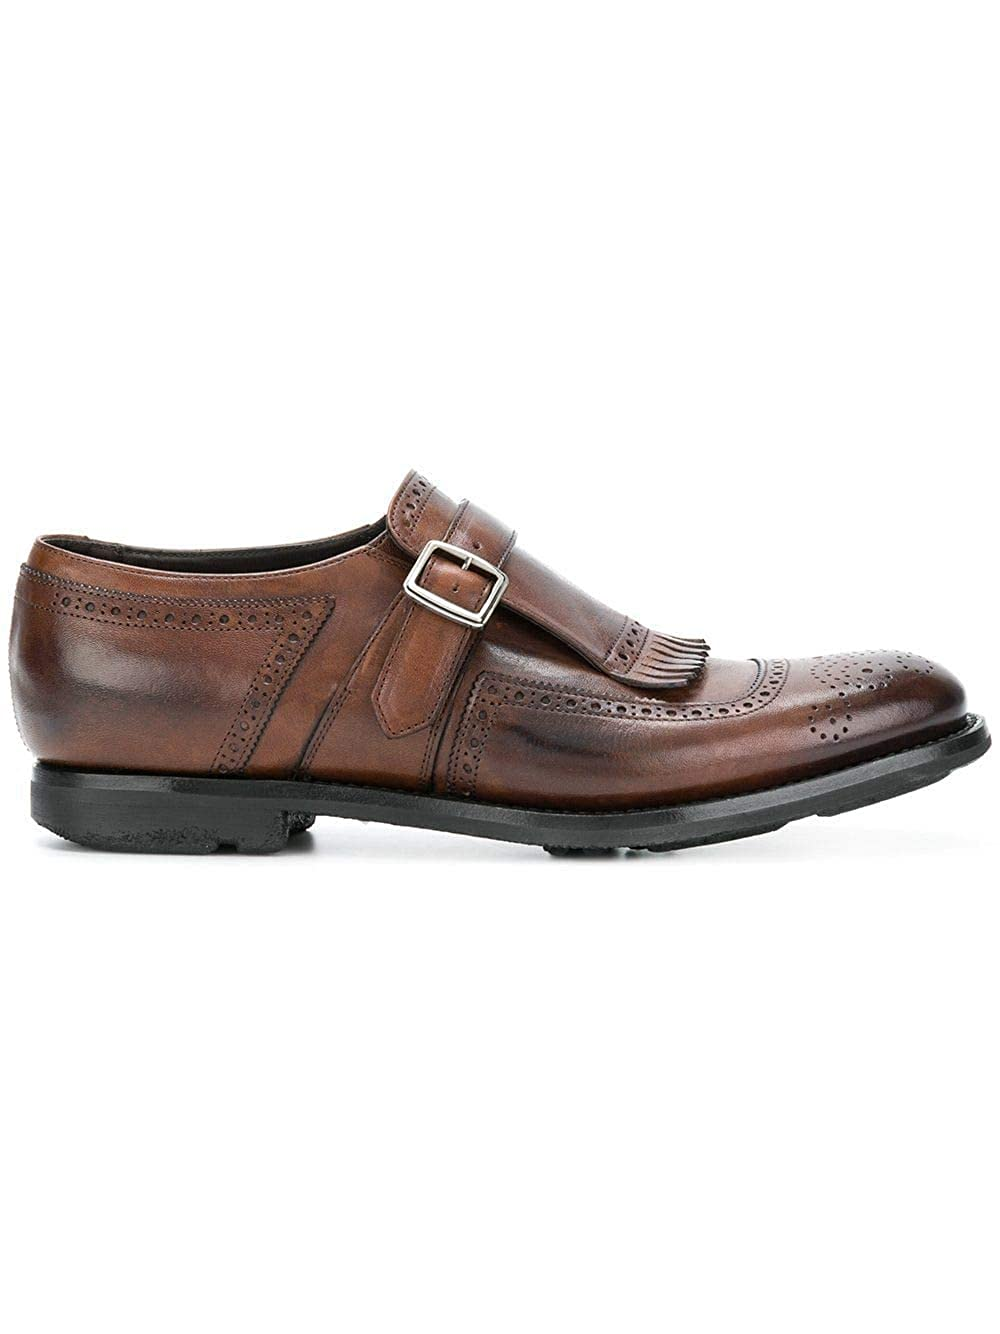 - Church& Church& Church& 039;s Herren EOG0019MOF0AXO Braun Leder Monk-Schuhe  Qualität zuerst Verbraucher zuerst